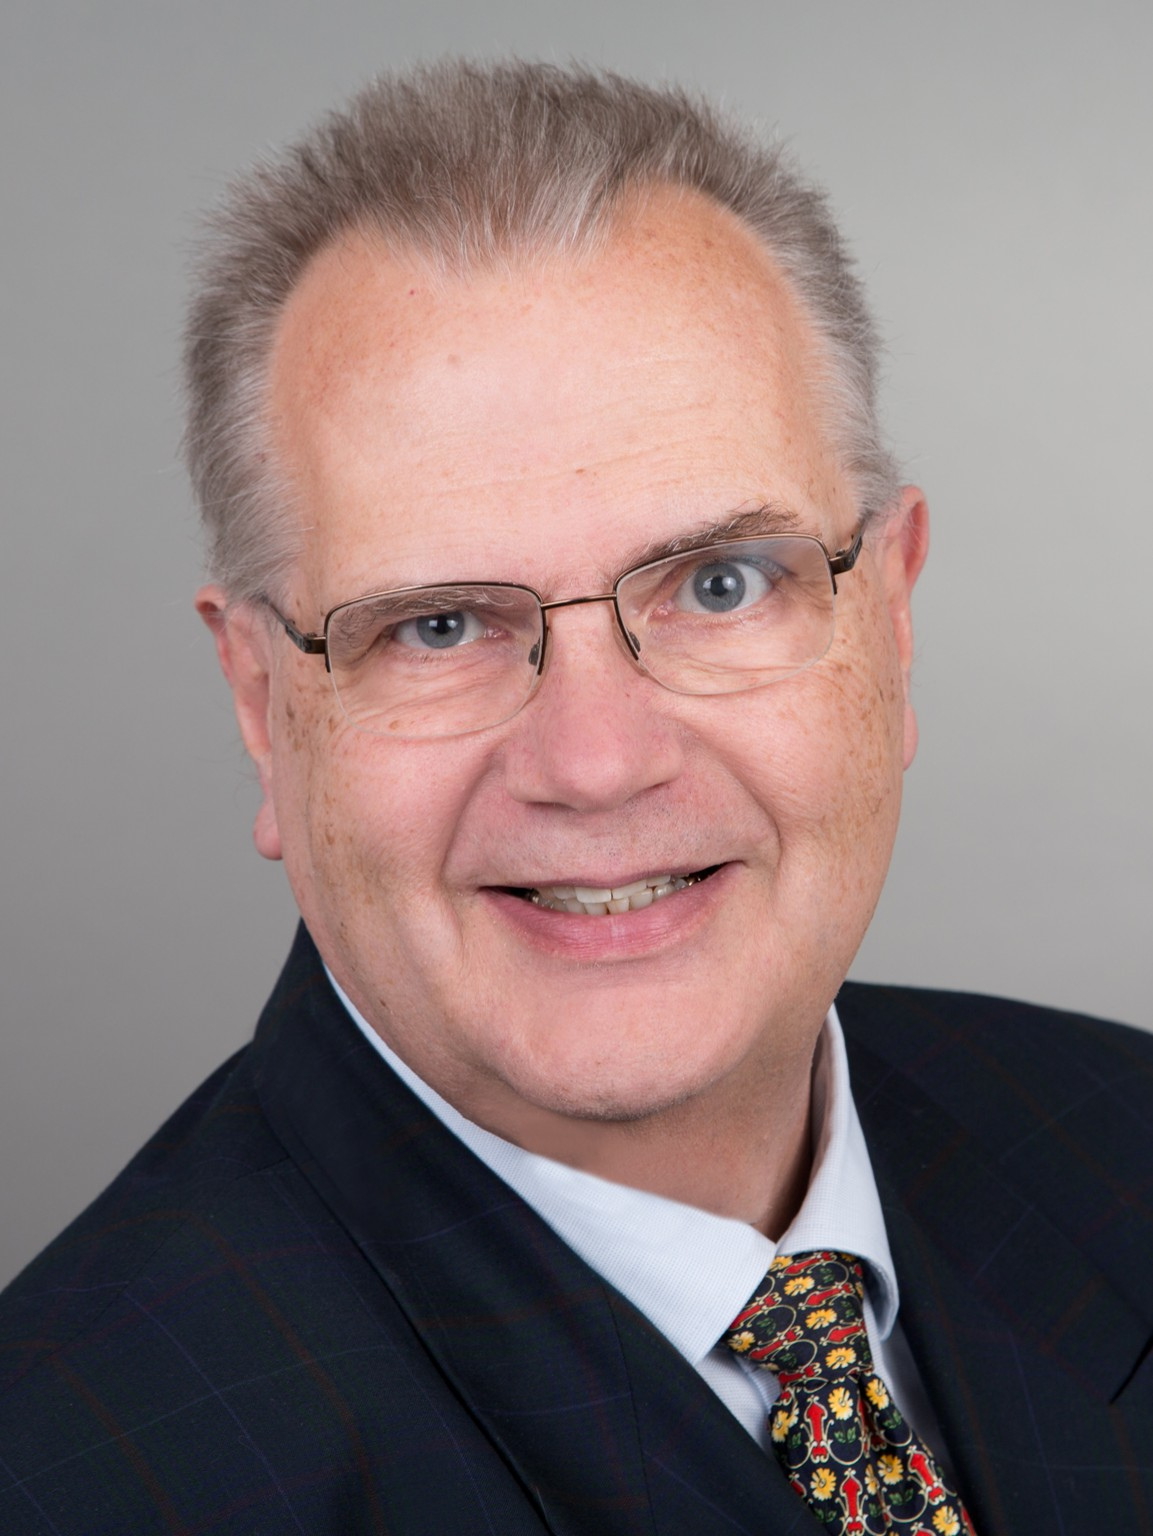 Michael Mueller picture